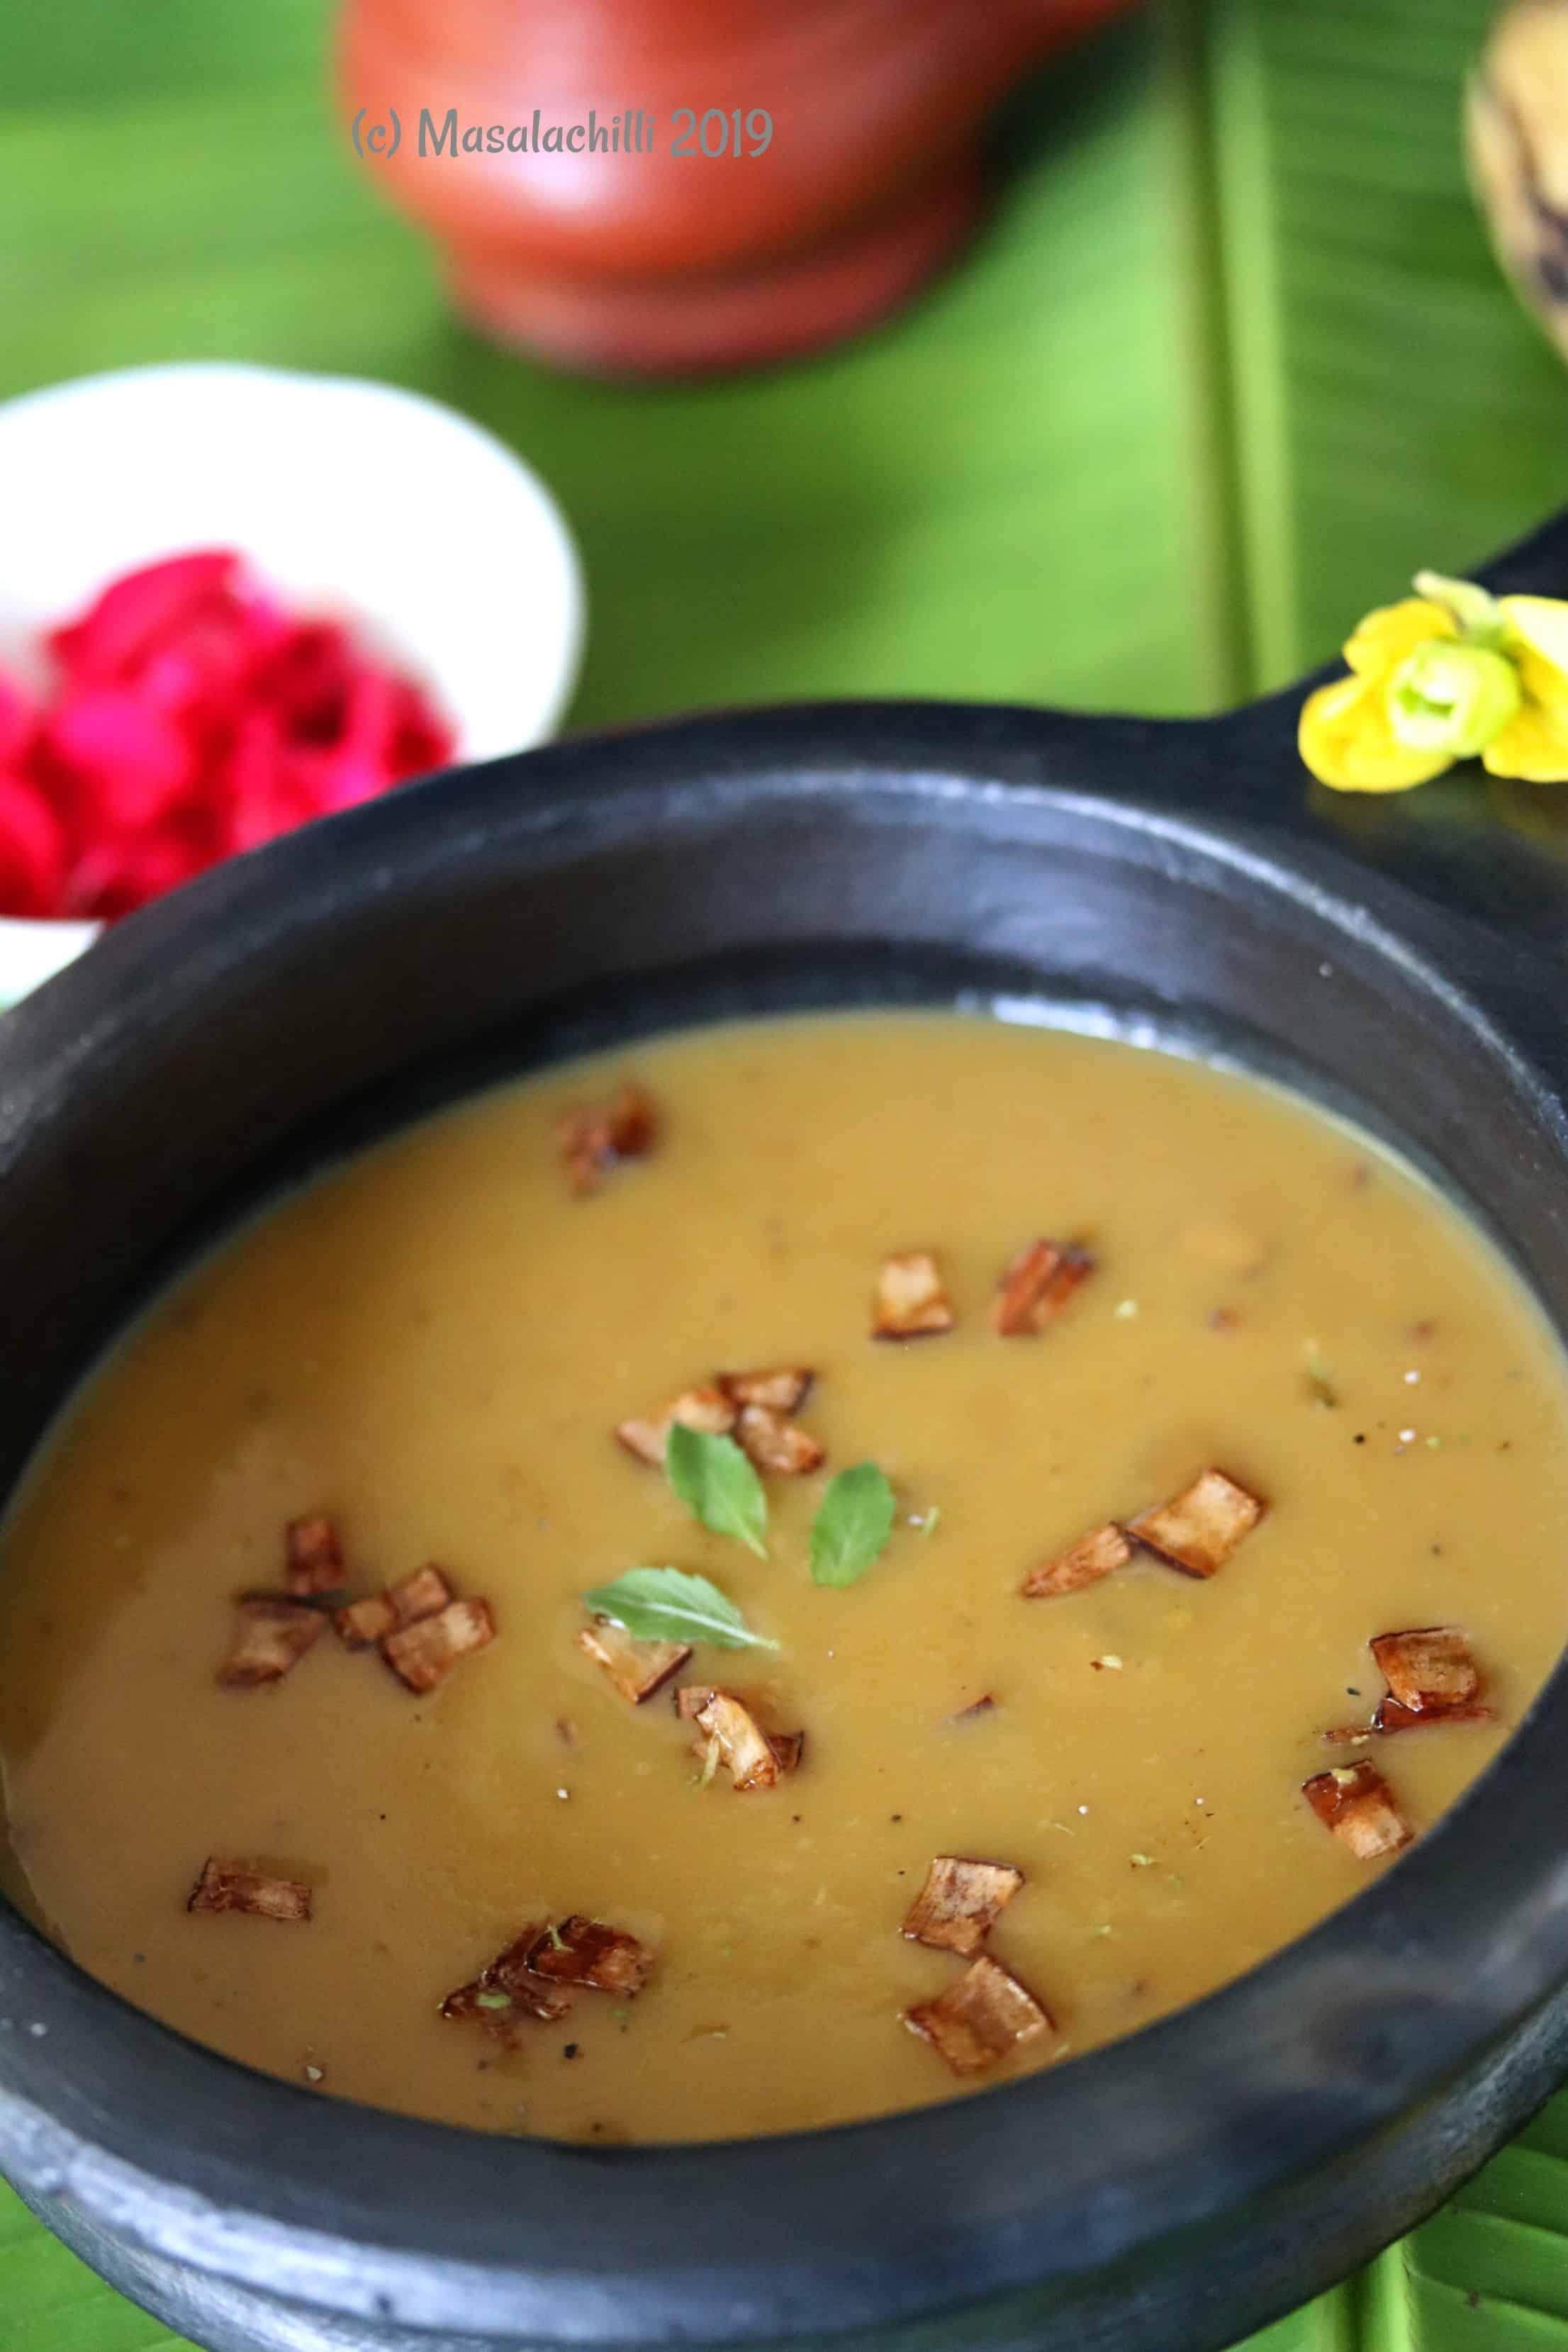 Traditional Kerala Dessert with jaggery and coconut milk called Nendram Pazham Pradhaman